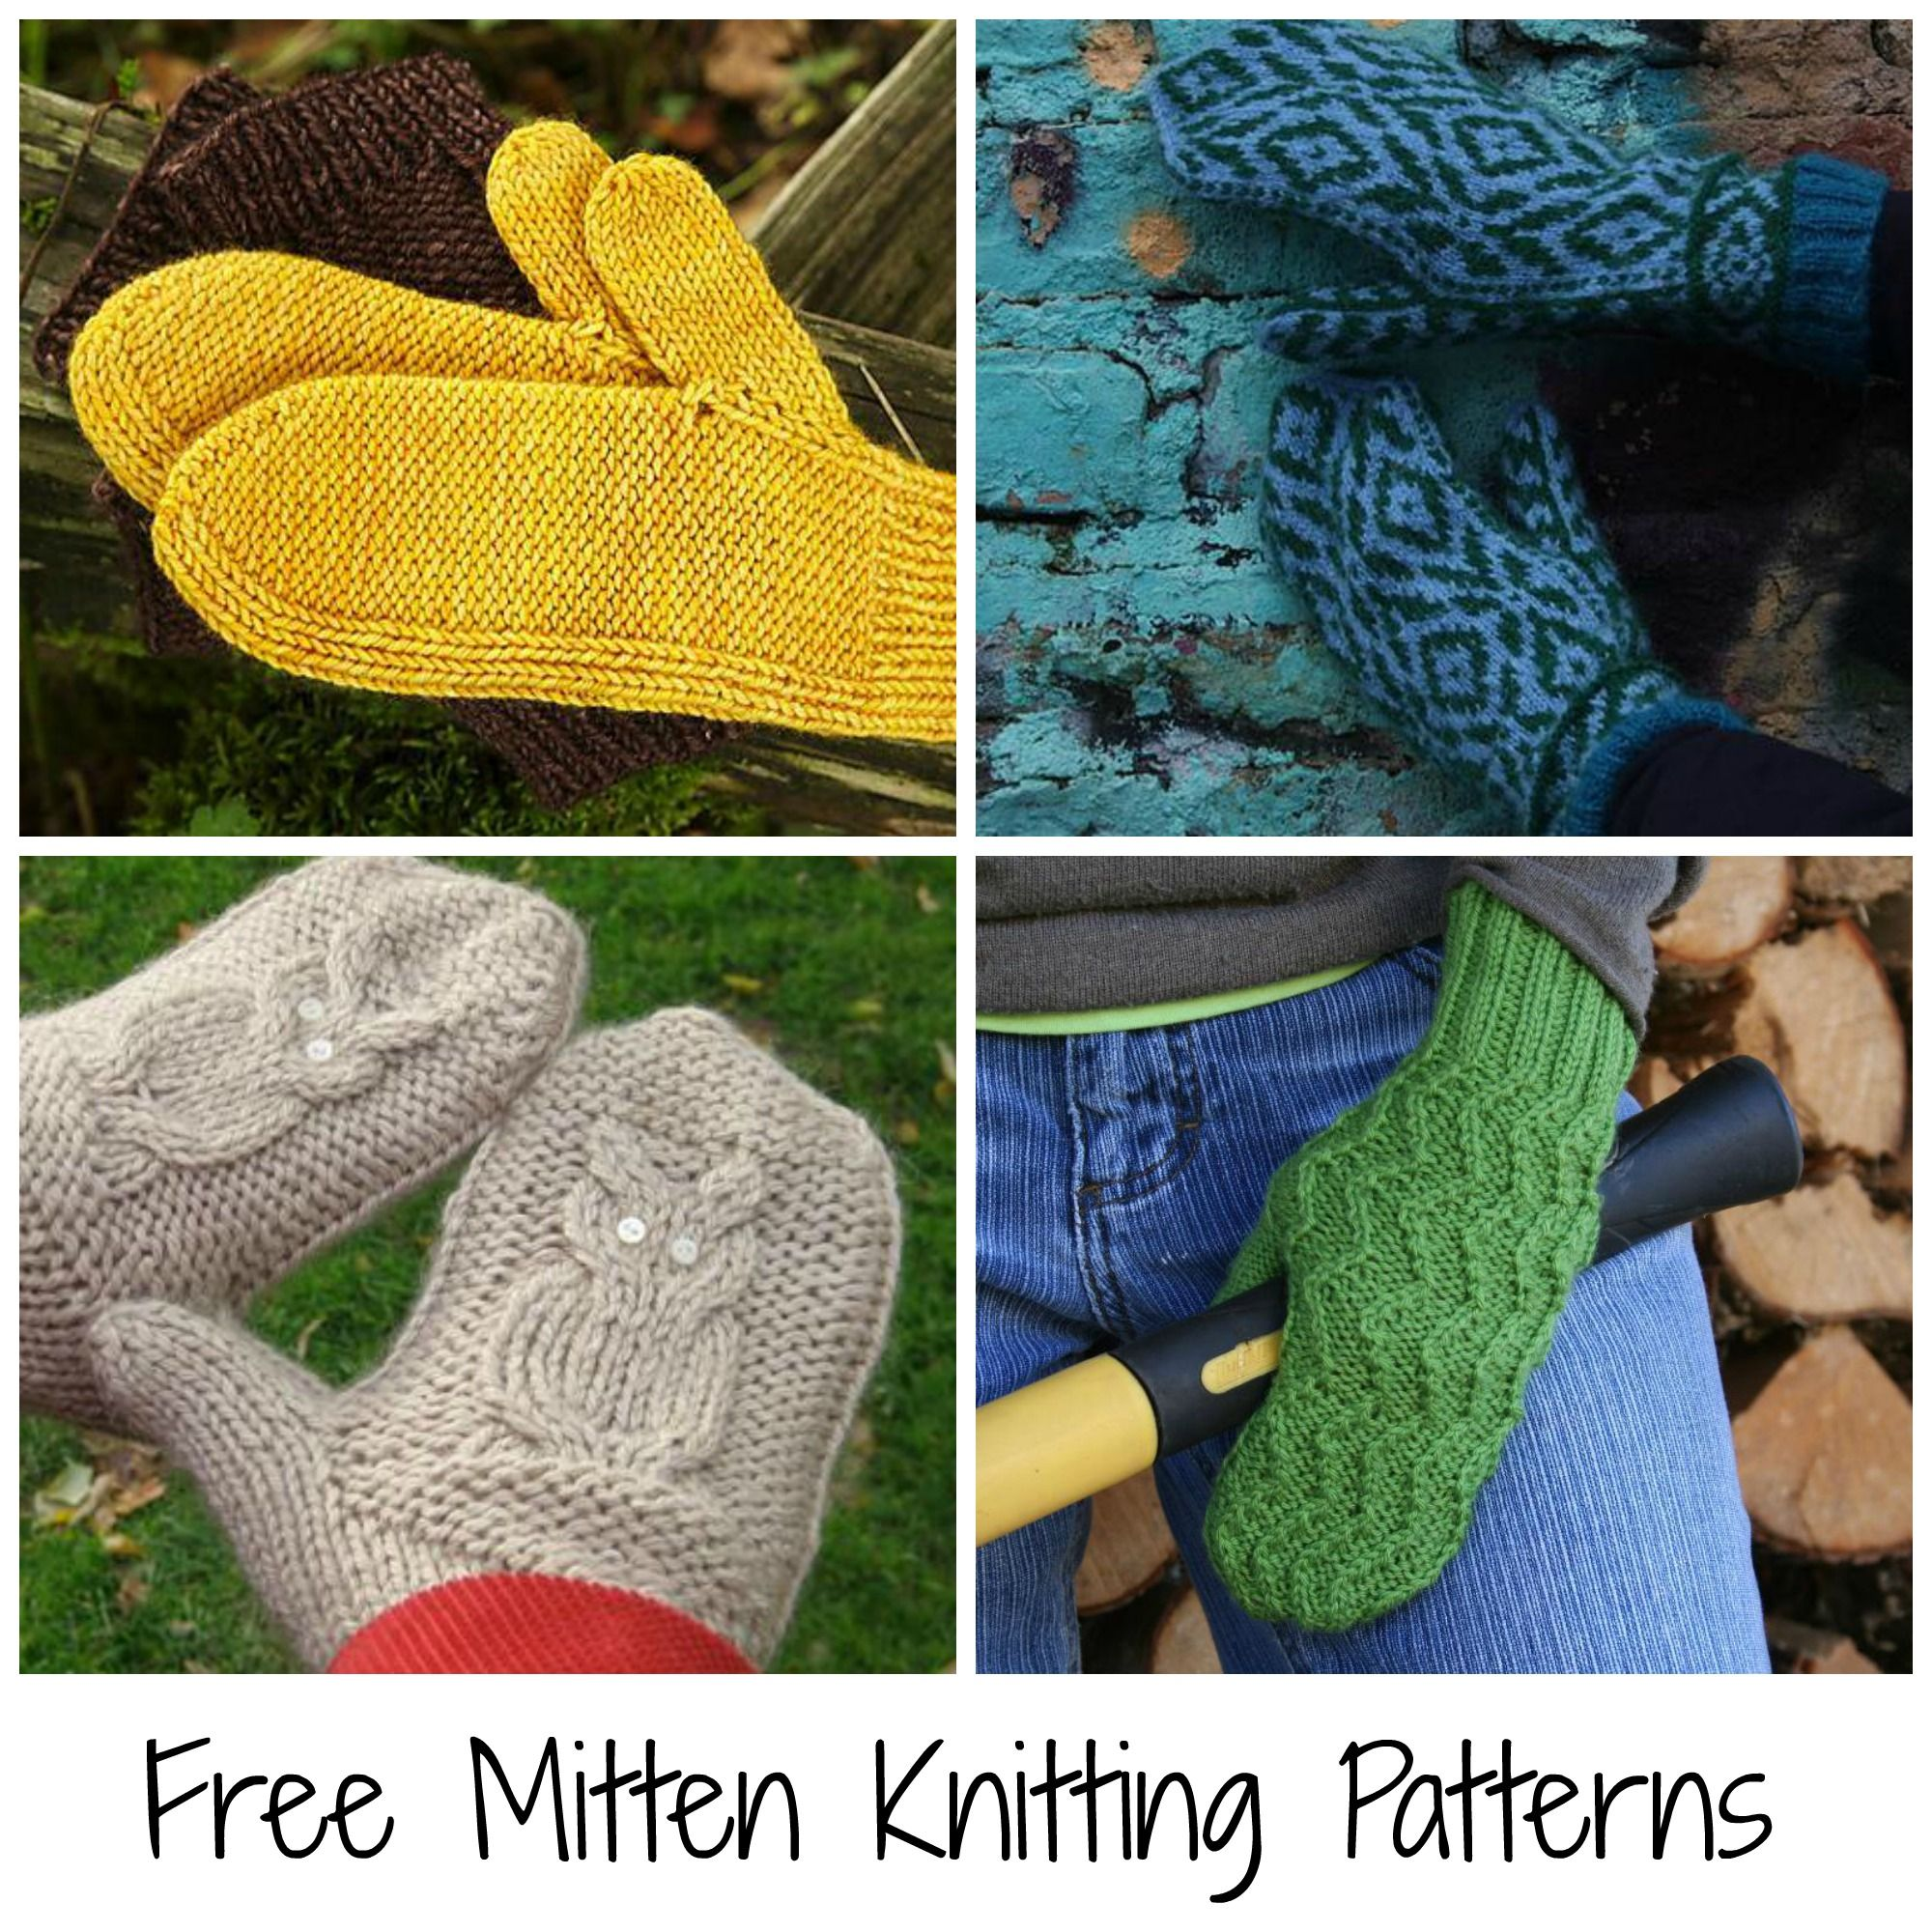 10 FREE Mitten Patterns to Knit | Mittens pattern, Mittens and Knit ...